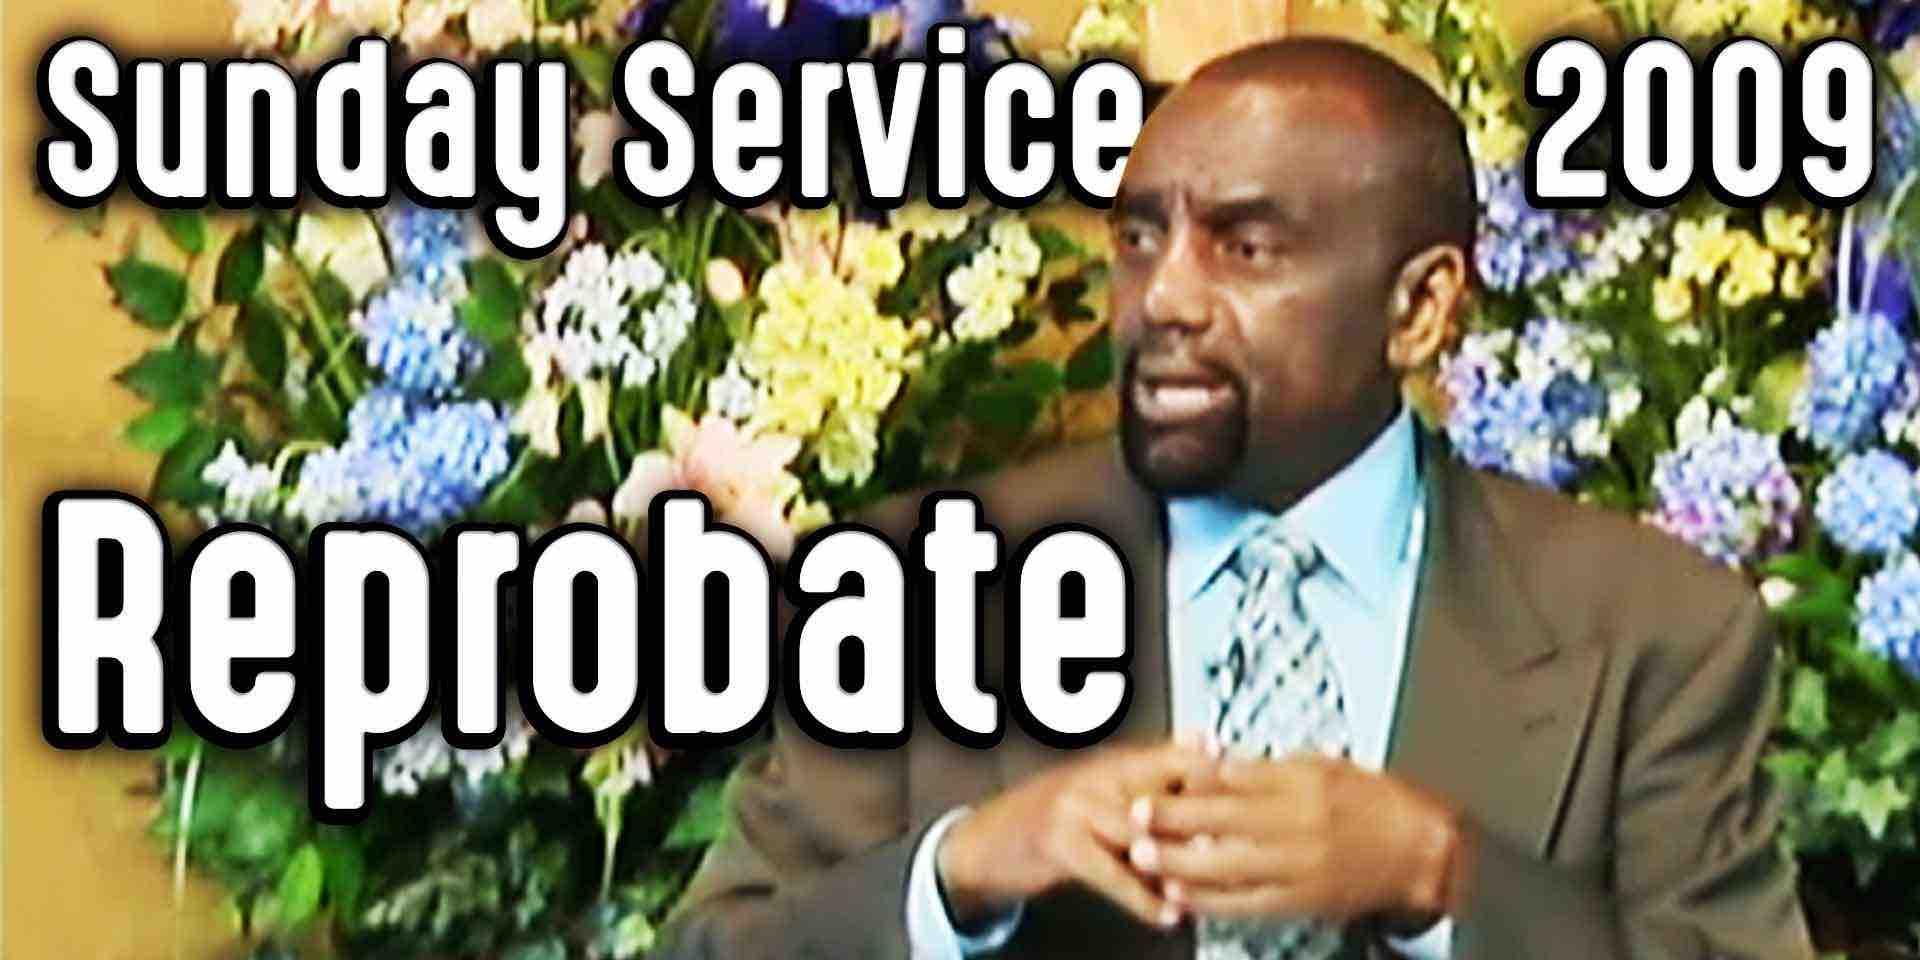 Reprobate Mind (Sunday Service 10/25/09)